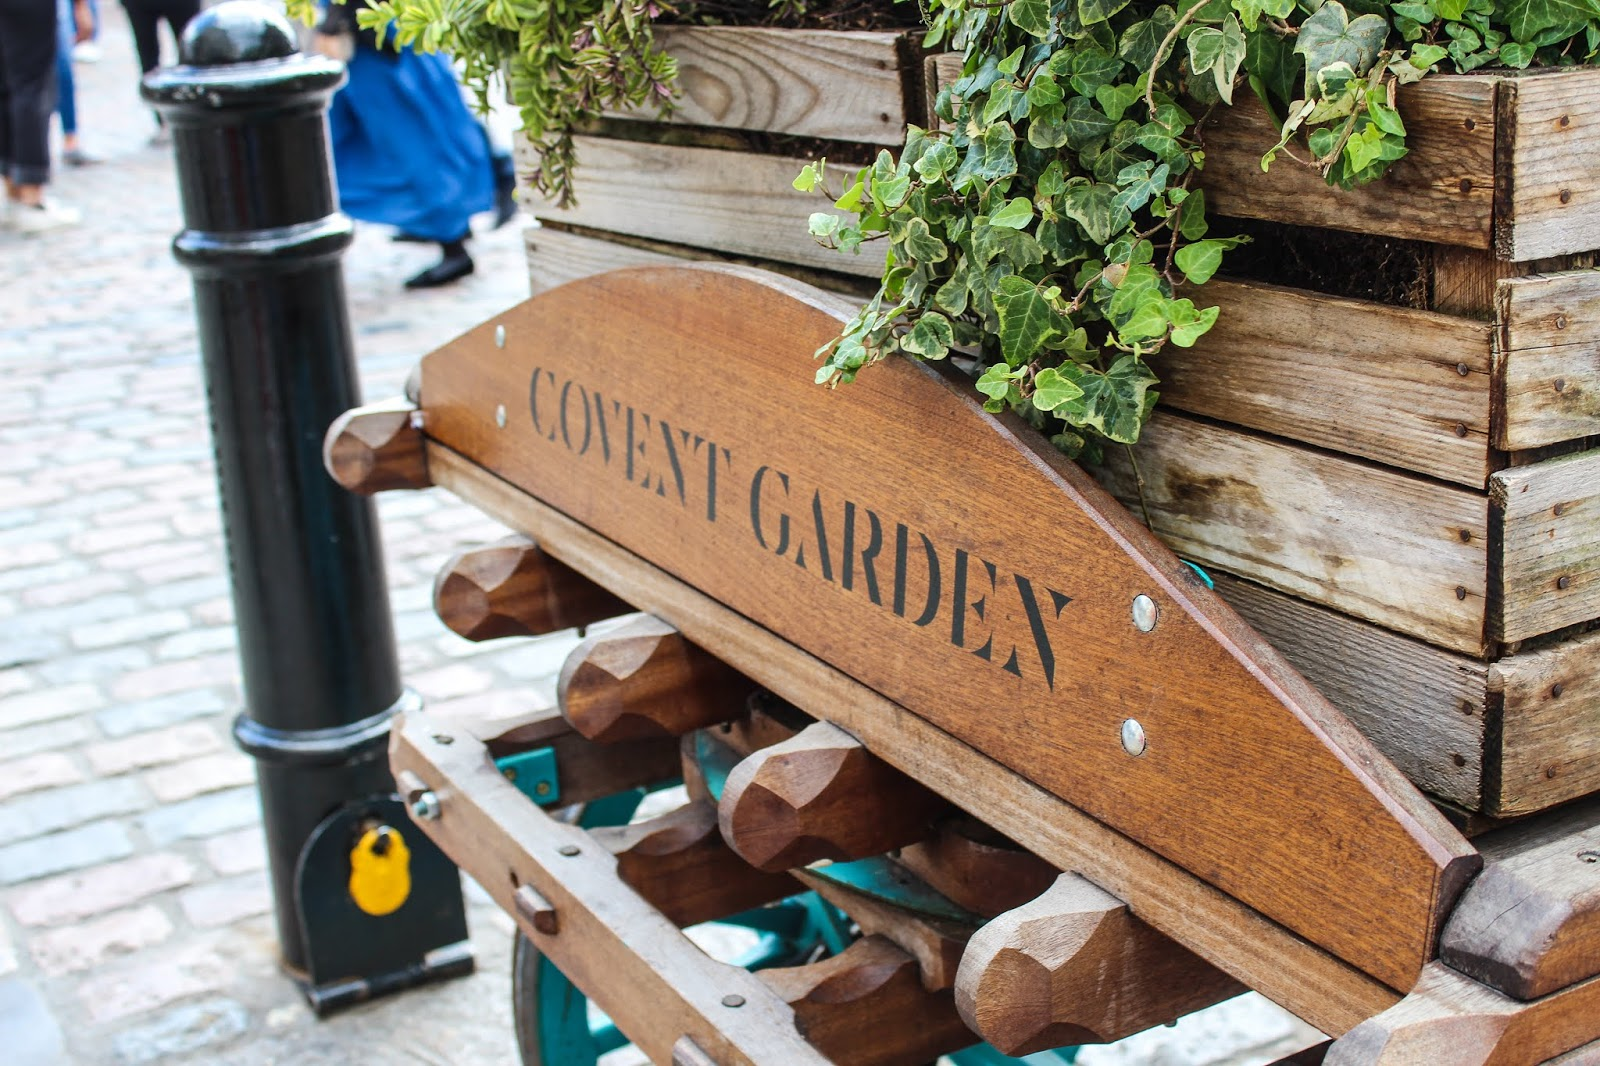 Exploring Covent Garden | AD